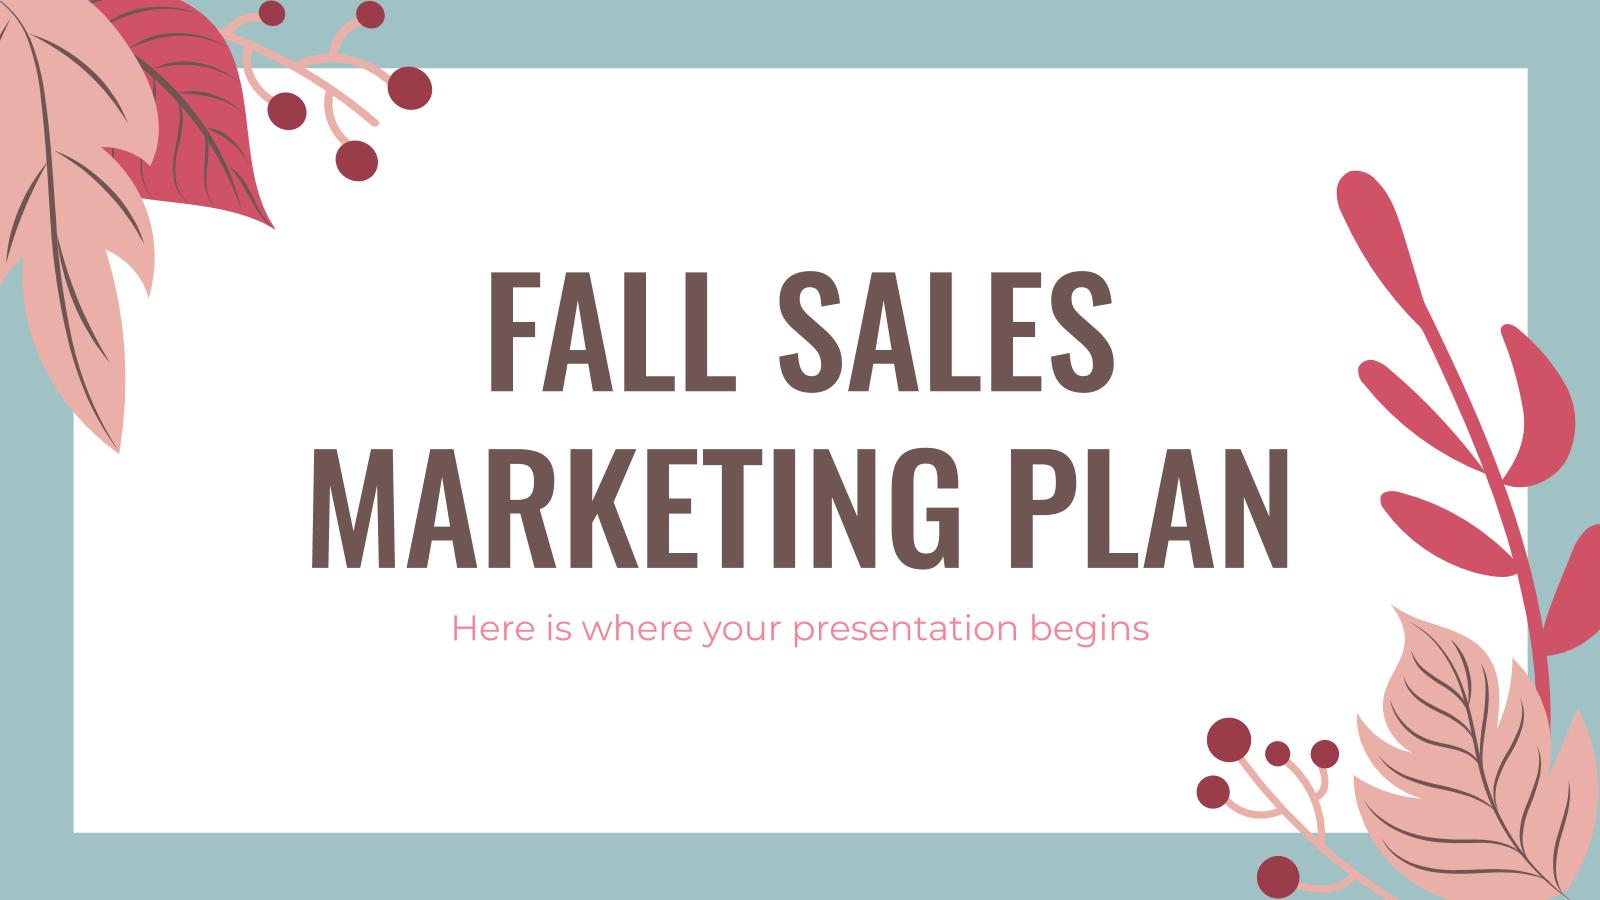 Fall Sales Marketing Plan presentation template